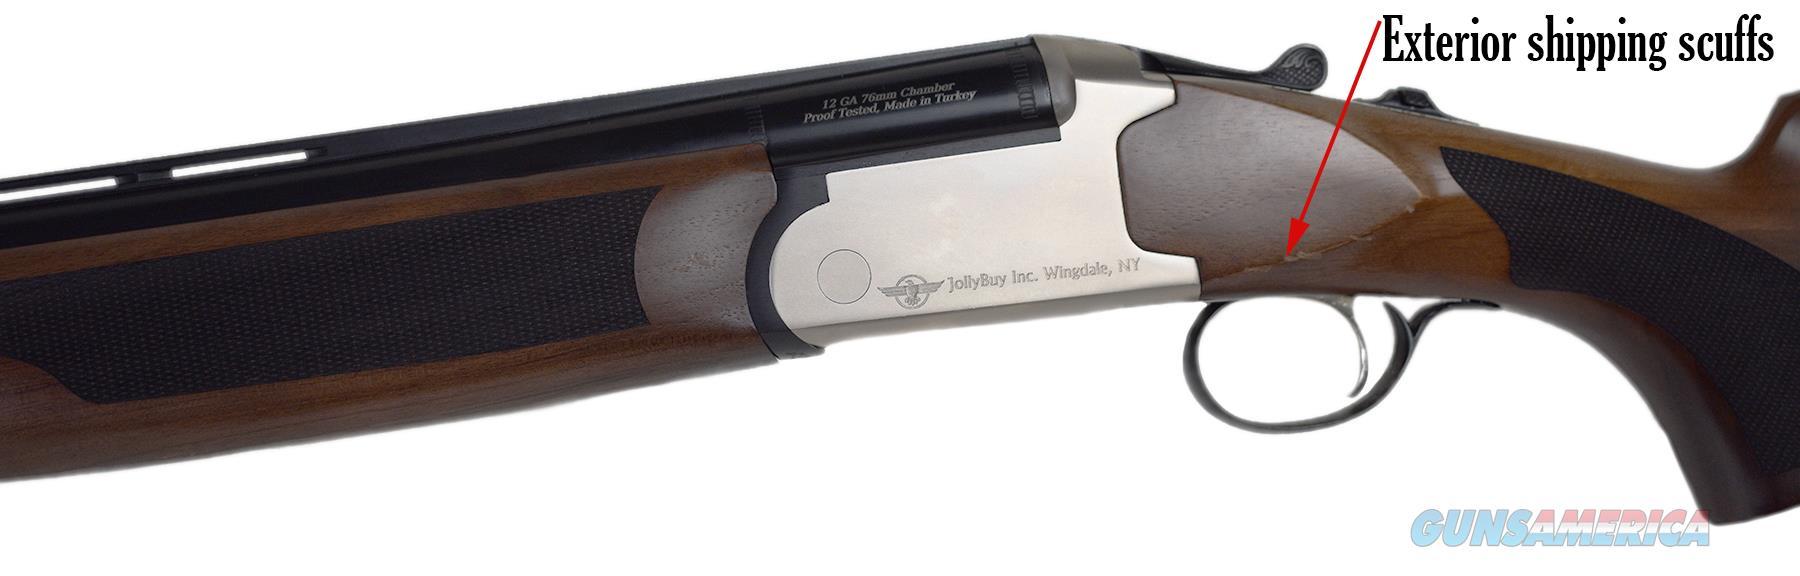 ArmElegant RM01 Over/Under 12GA Shotgun  Guns > Shotguns > A Misc Shotguns